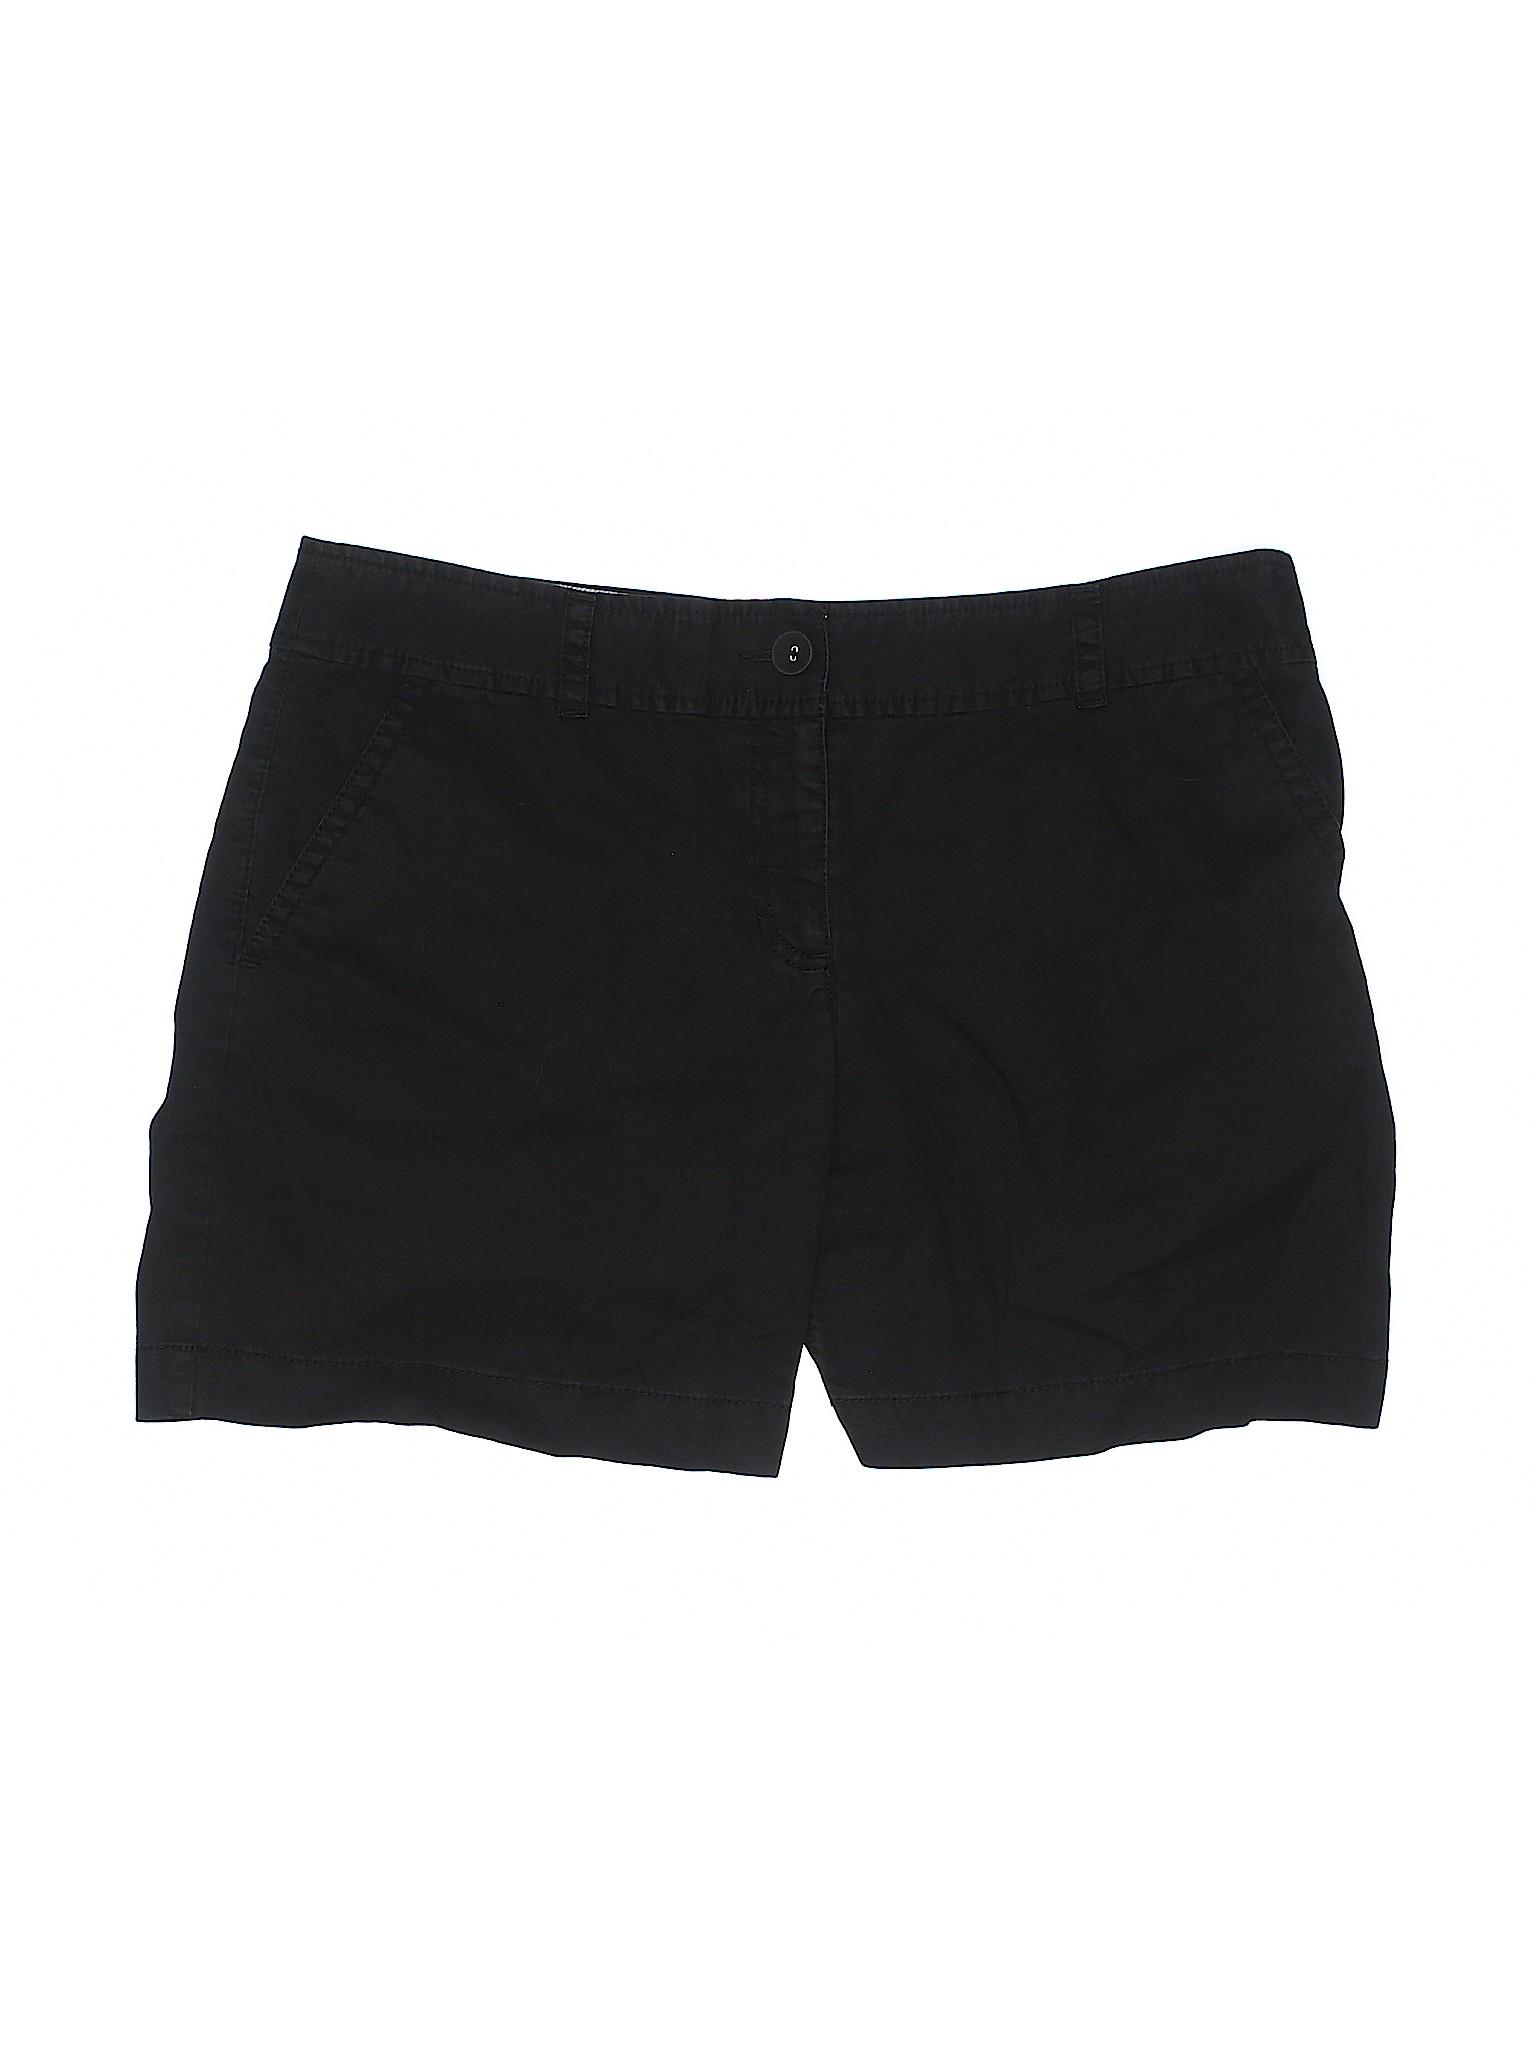 Shorts Khaki Taylor Ann Boutique LOFT IwXfqxBX6n